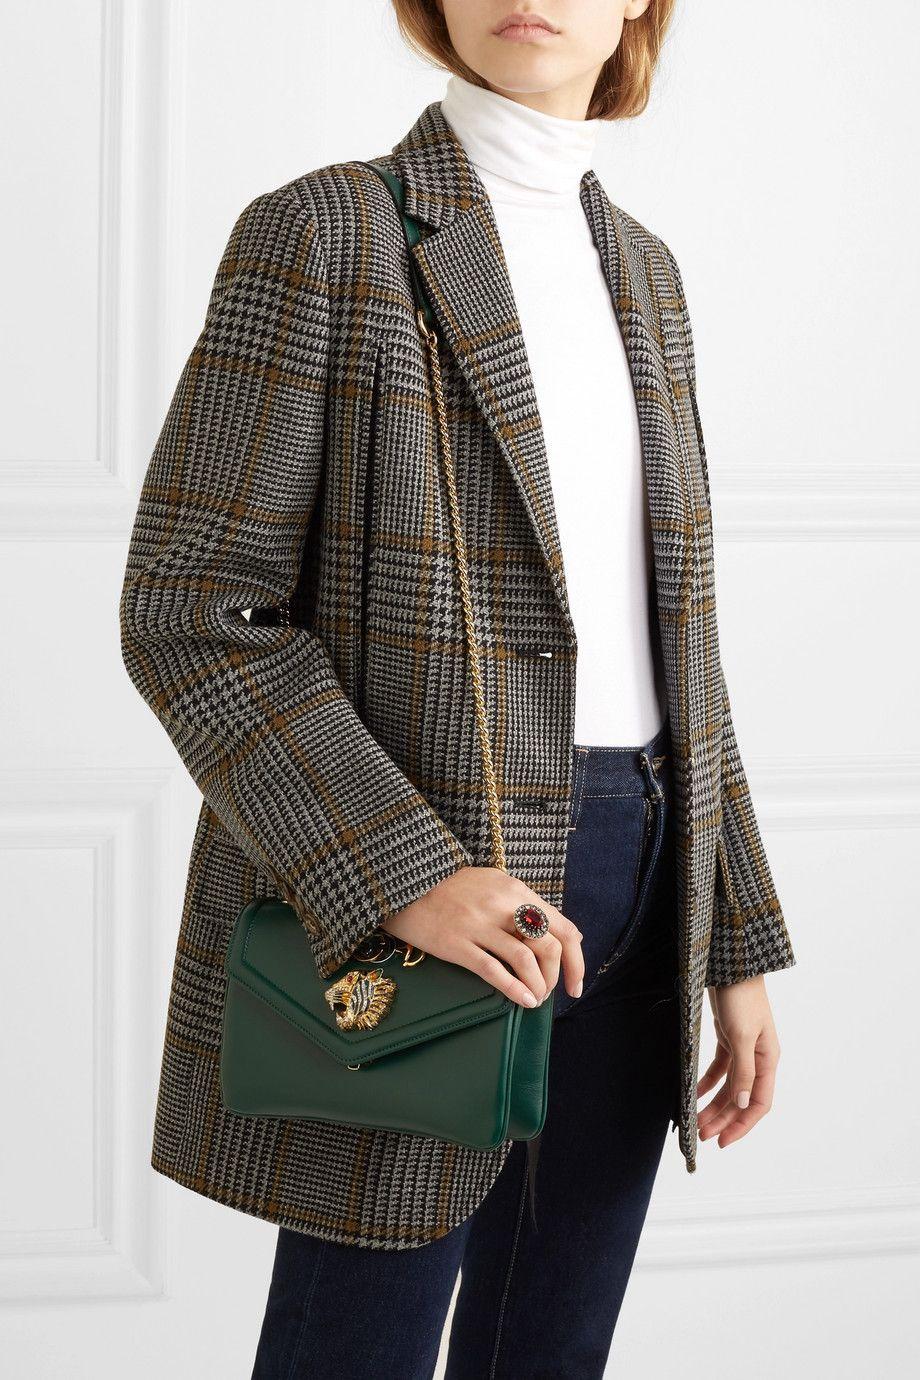 a702ffbfa6f4 Gucci   Rajah small embellished leather shoulder bag   NET-A-PORTER.COM